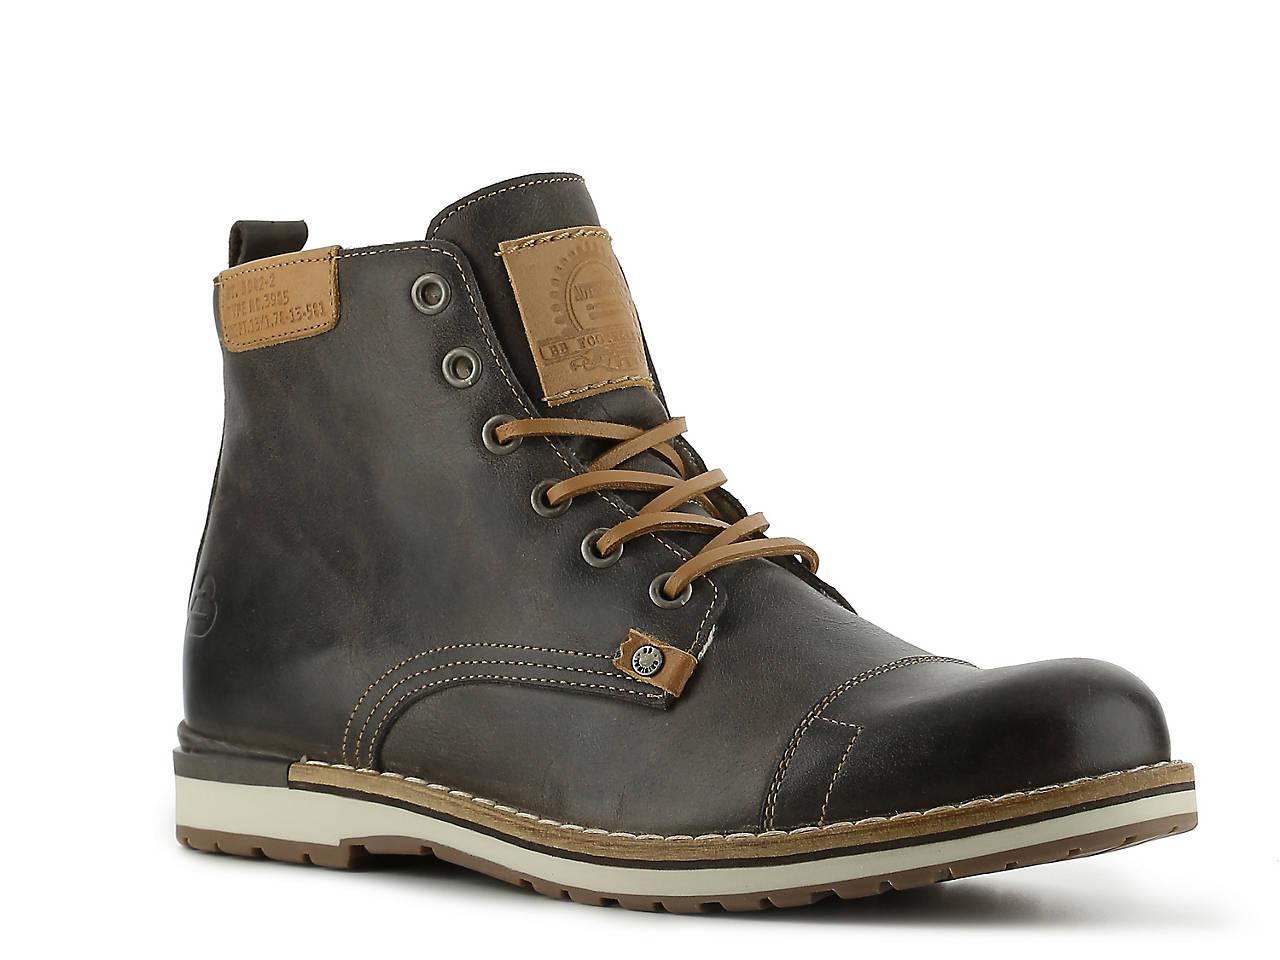 Mens WARM BOOTTIE Boots Bullboxer GFPsK